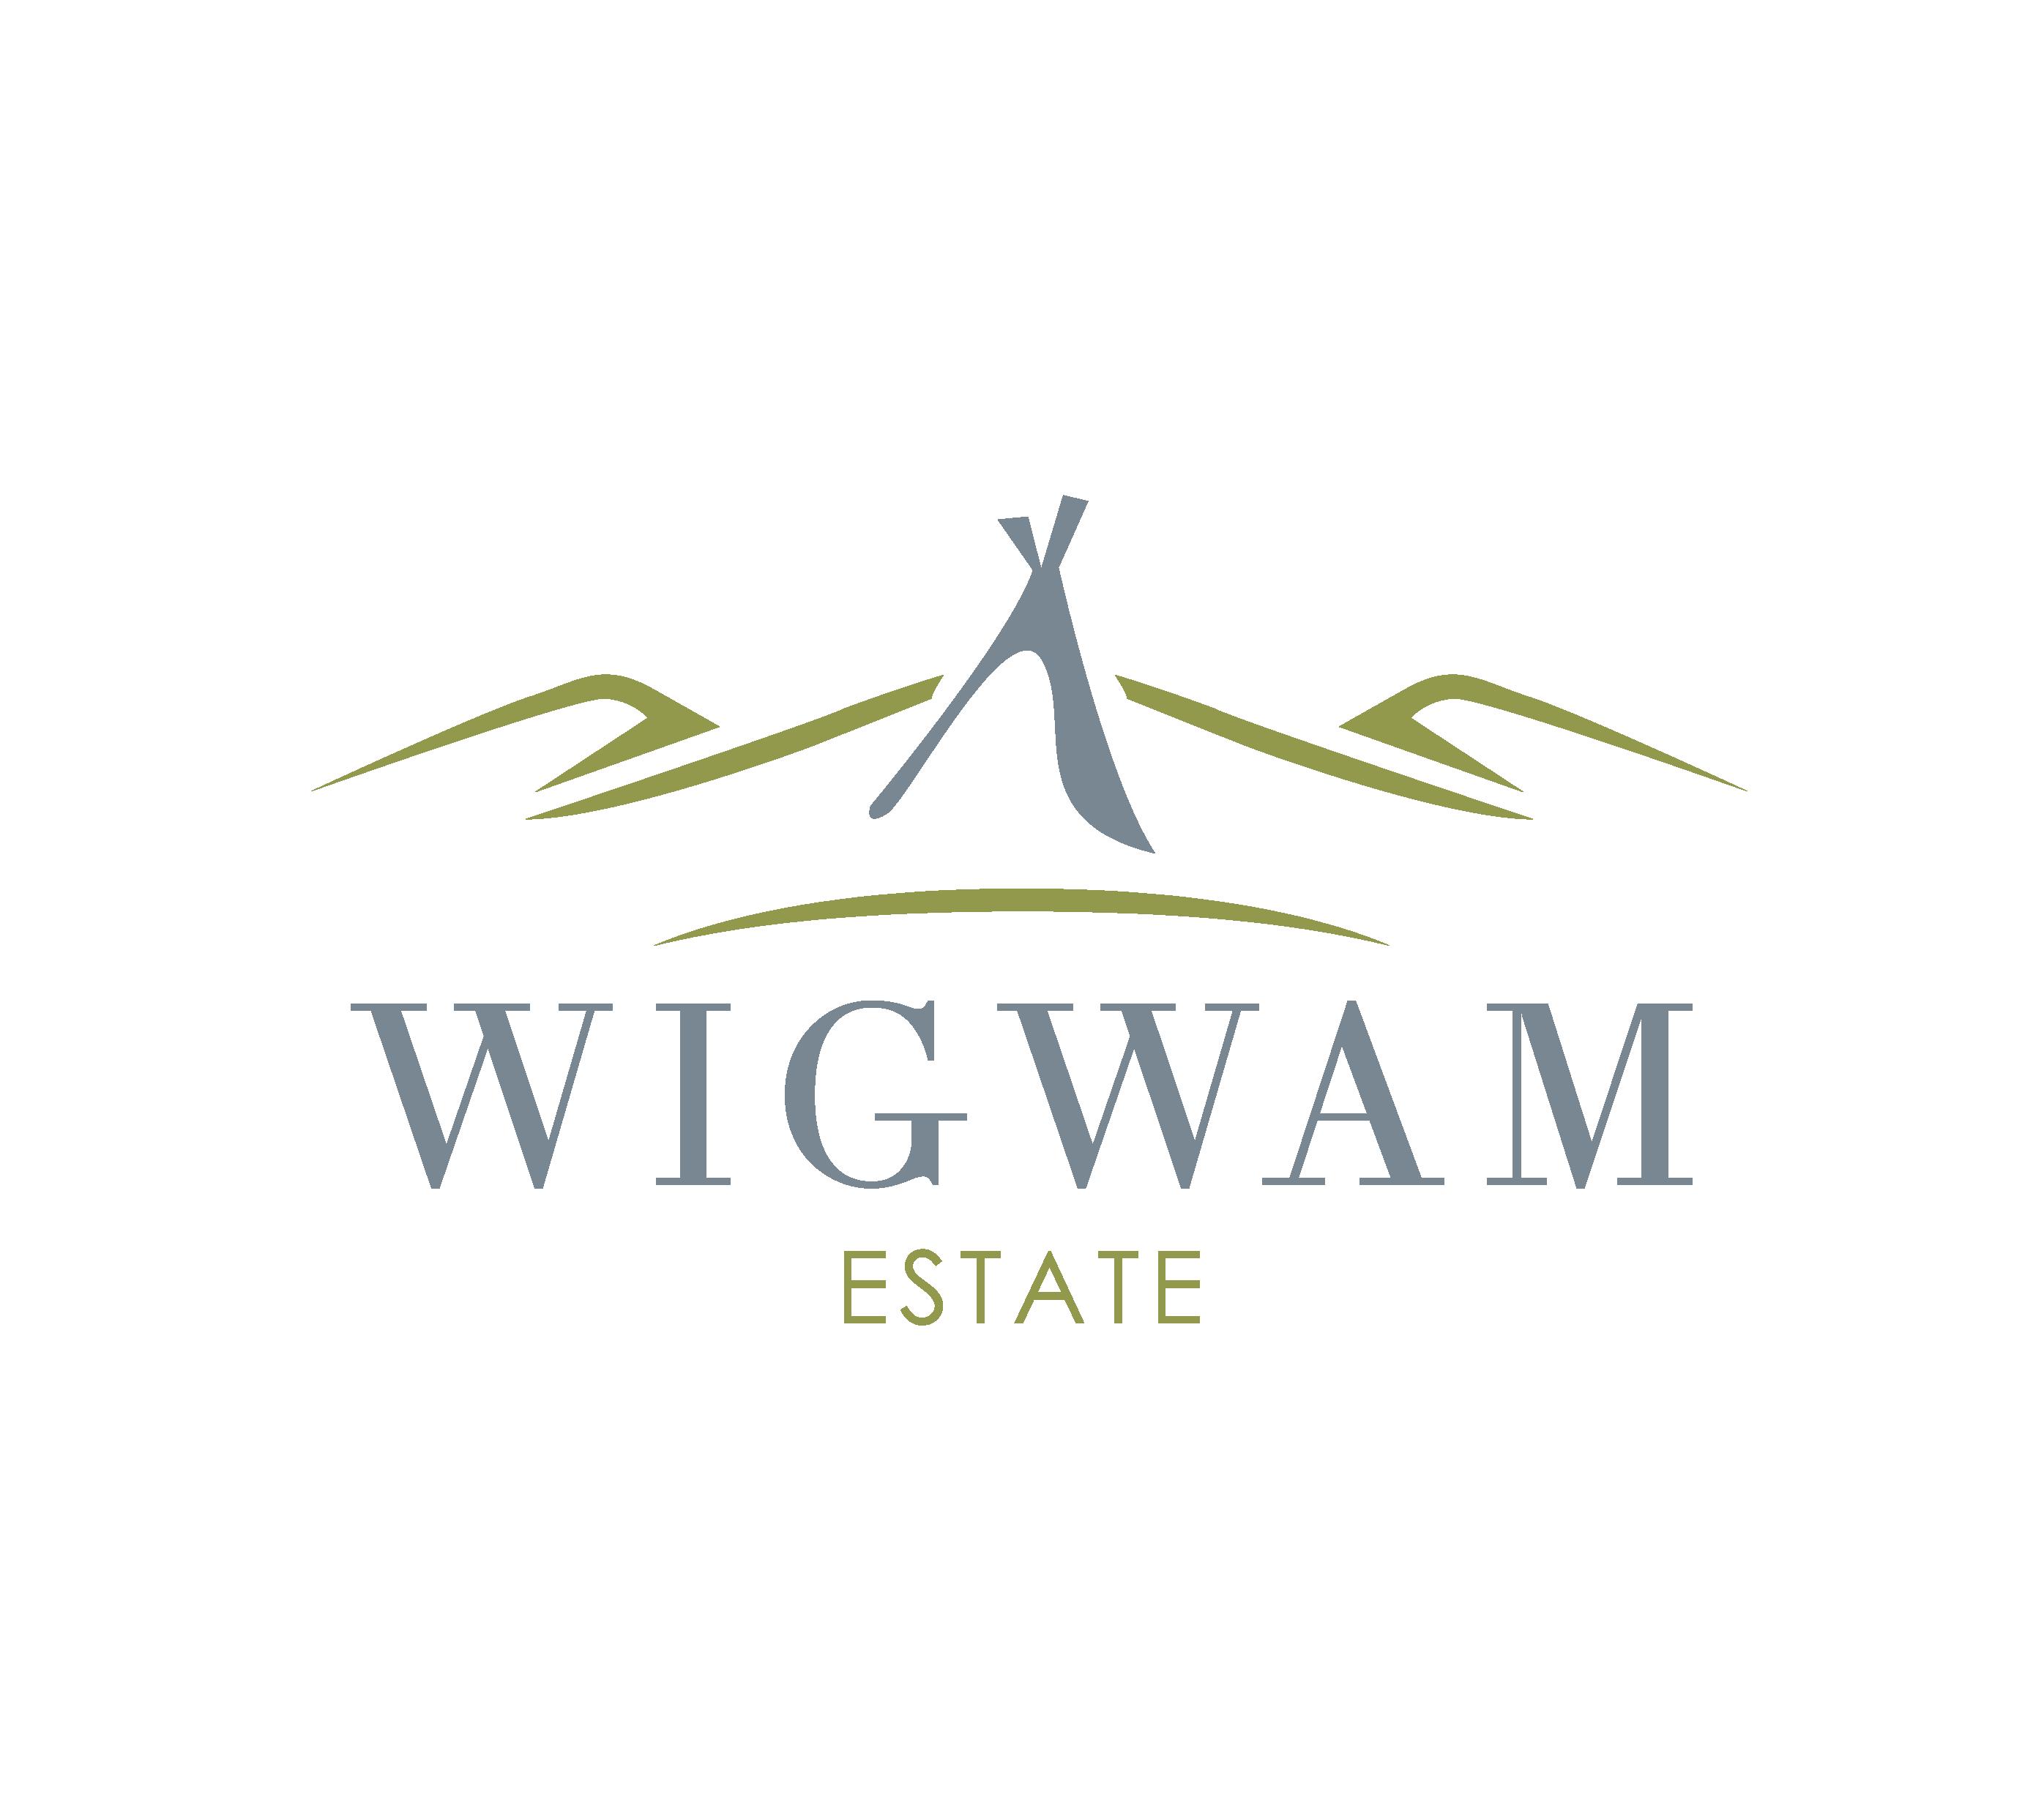 Wigwam Retirement Estate